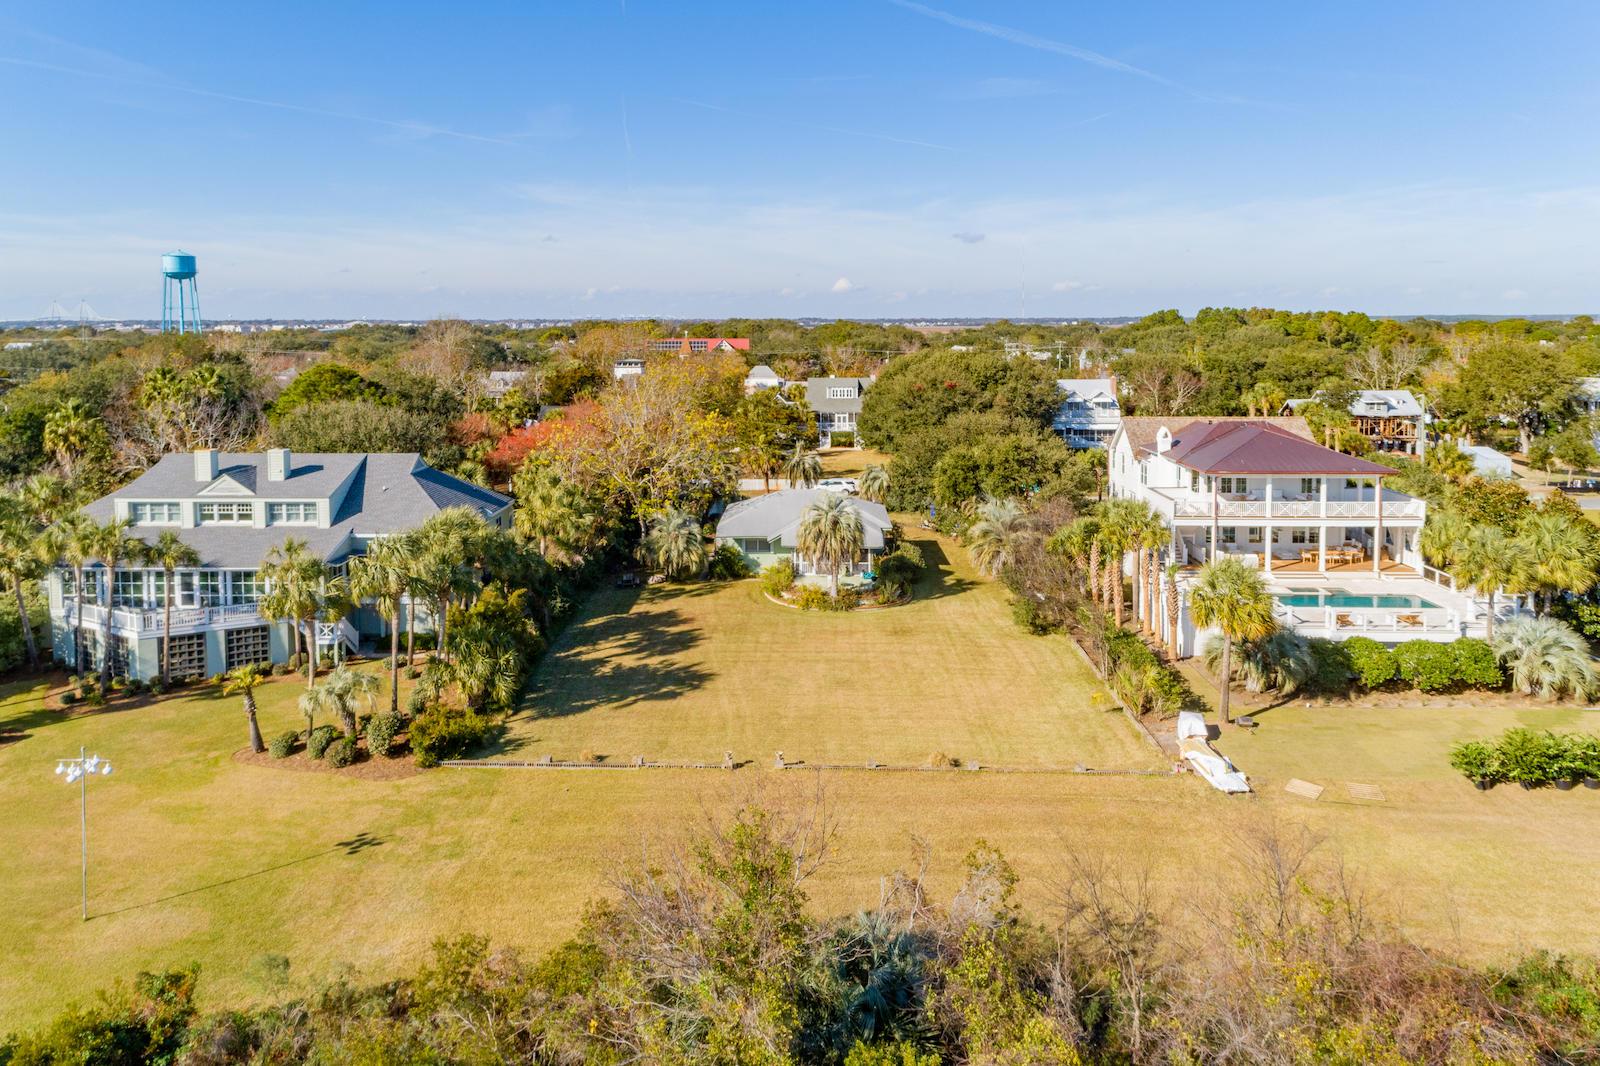 Sullivans Island Homes For Sale - 2525 Atlantic, Sullivans Island, SC - 10